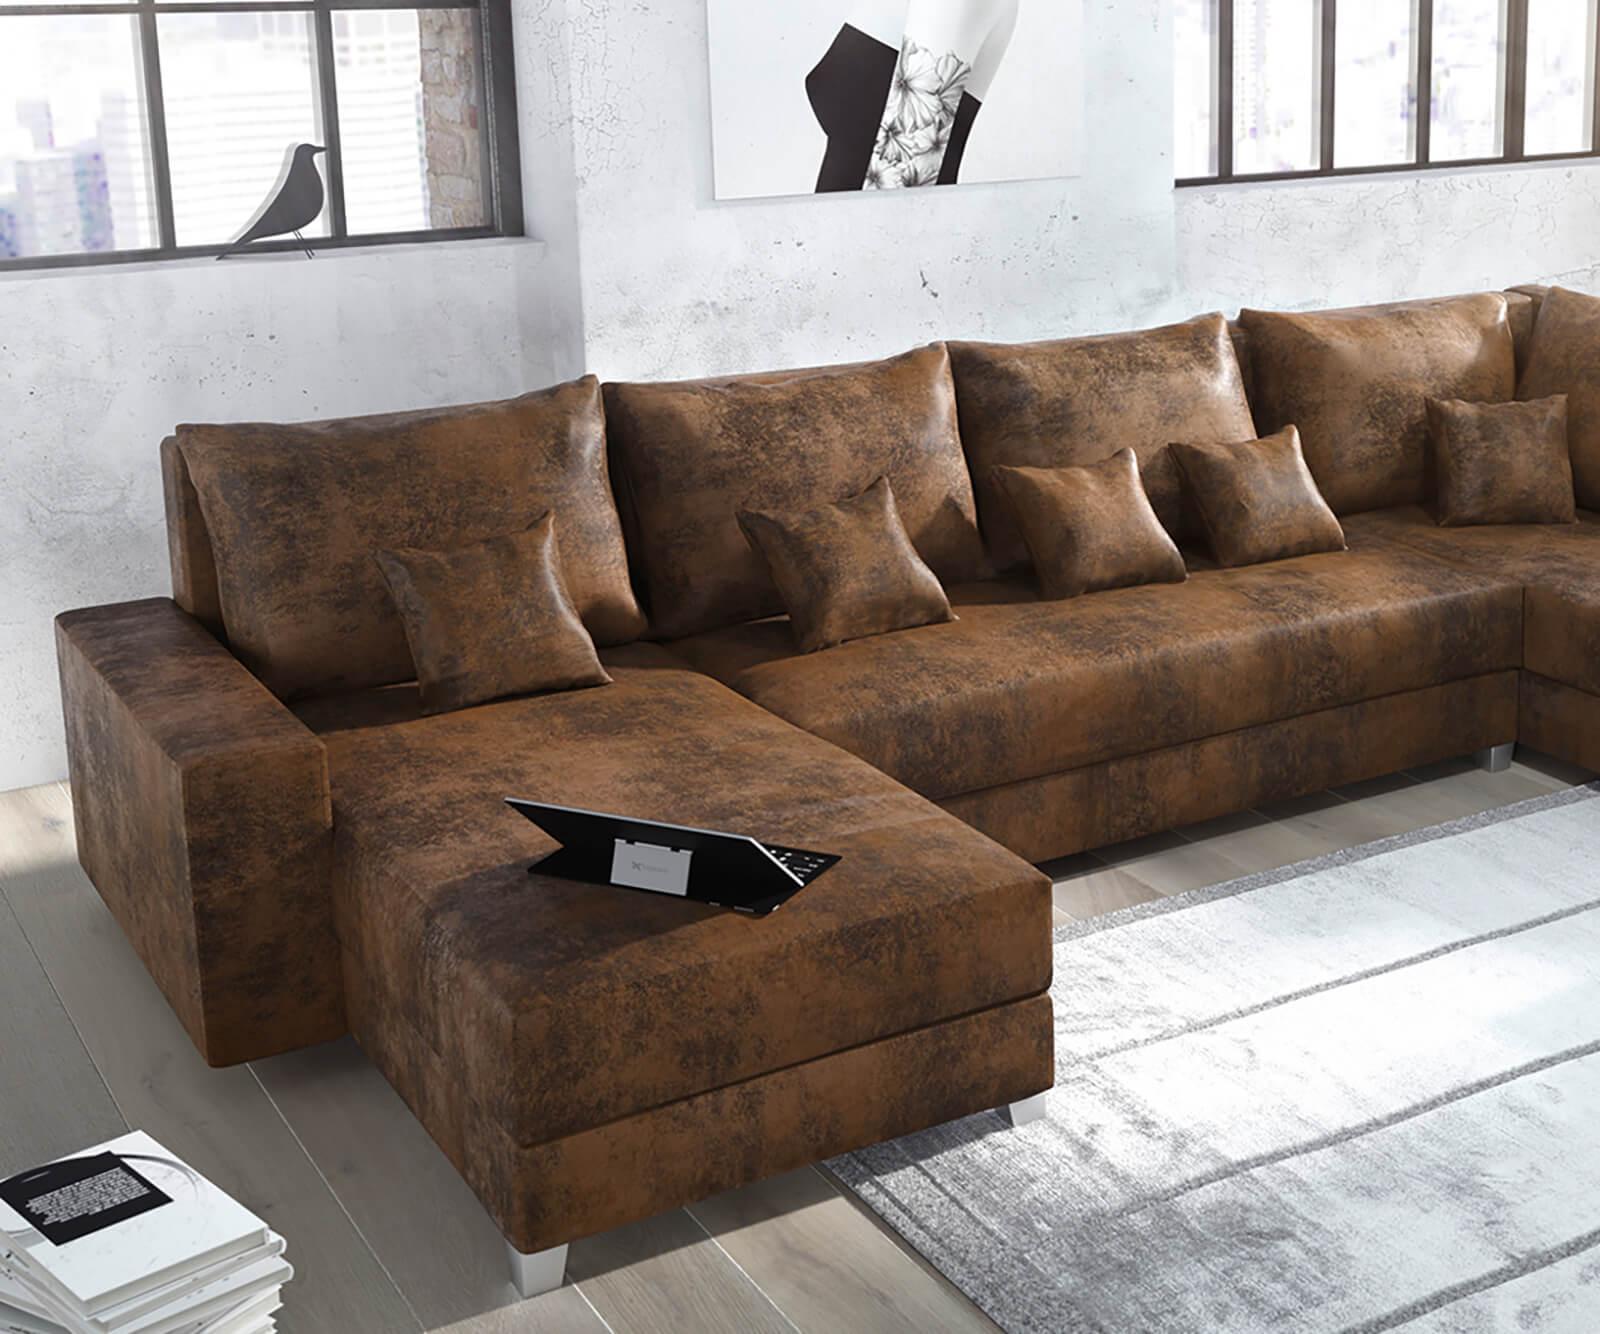 couch panama braun ottomane rechts longchair links wohnlandschaft modular. Black Bedroom Furniture Sets. Home Design Ideas